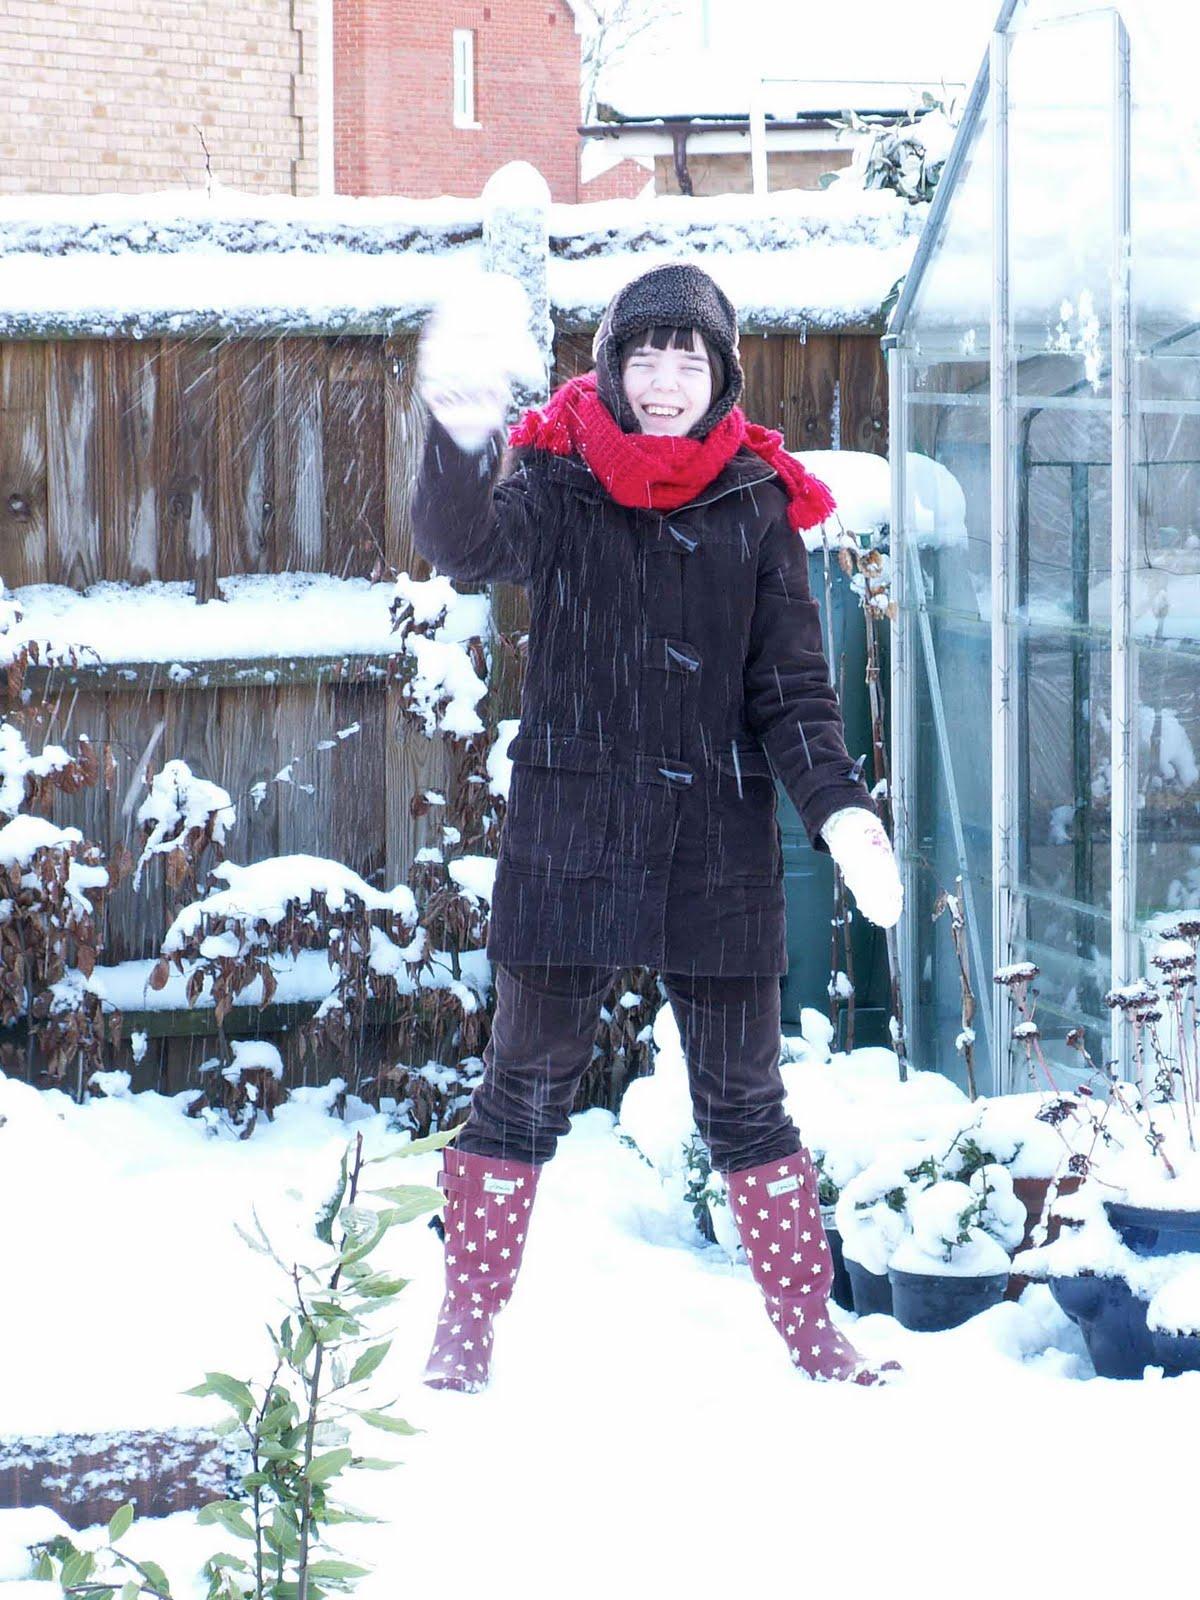 [snowball]